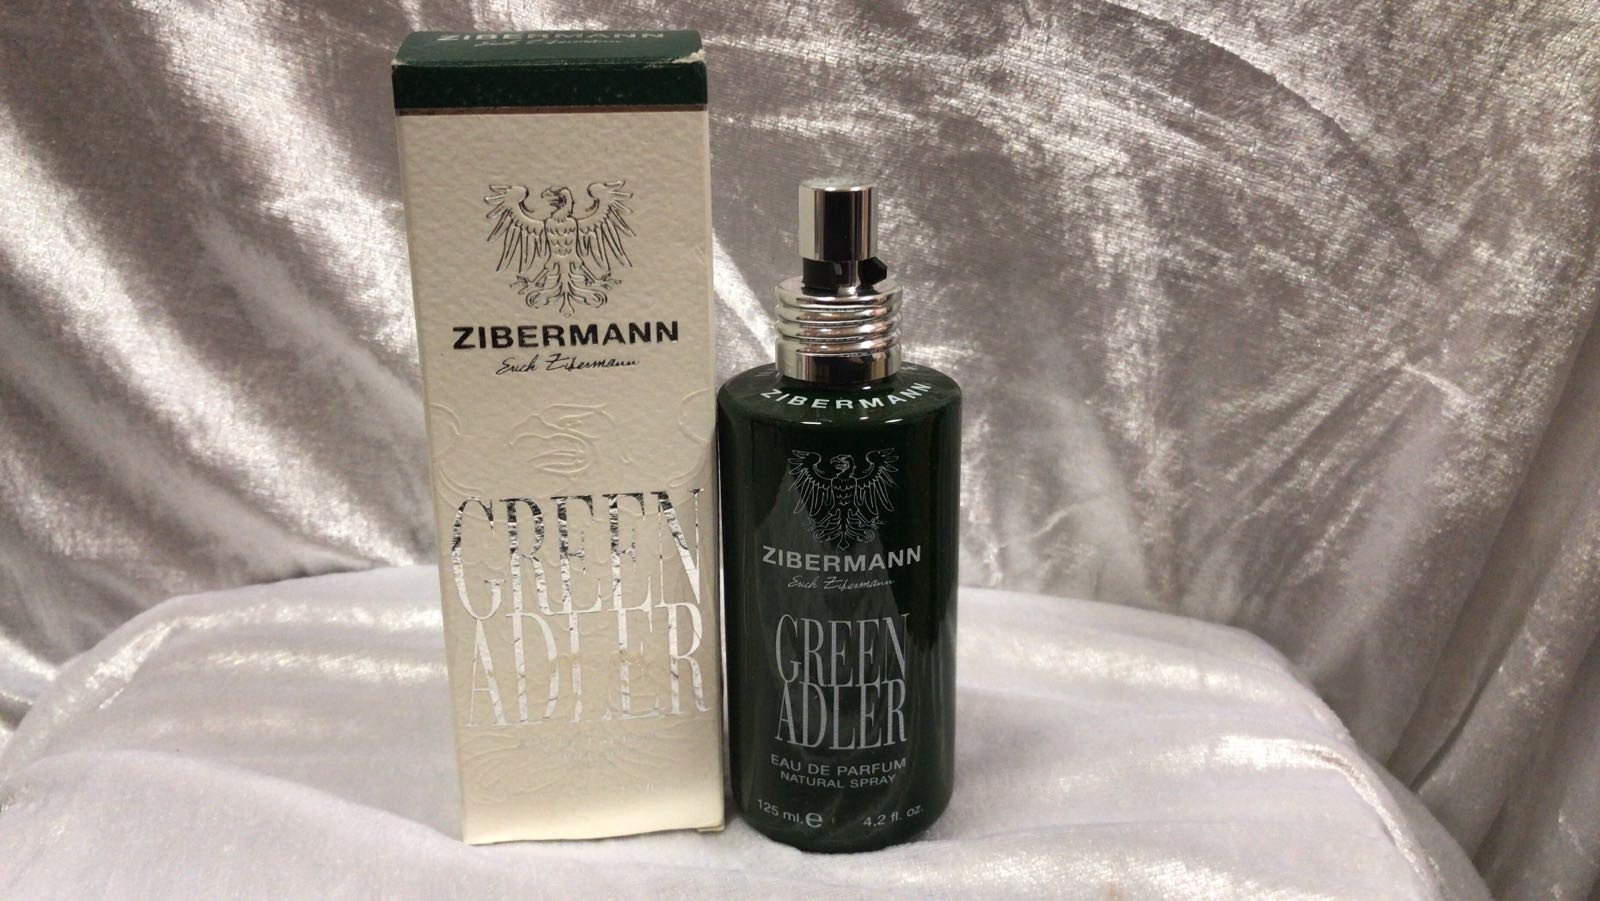 best online 100% genuine uk cheap sale ZIBERMANN ADLER GREEN UNISEX PROFUMO UOMO DONNA EDP 125 ML VAPO Perfume Men